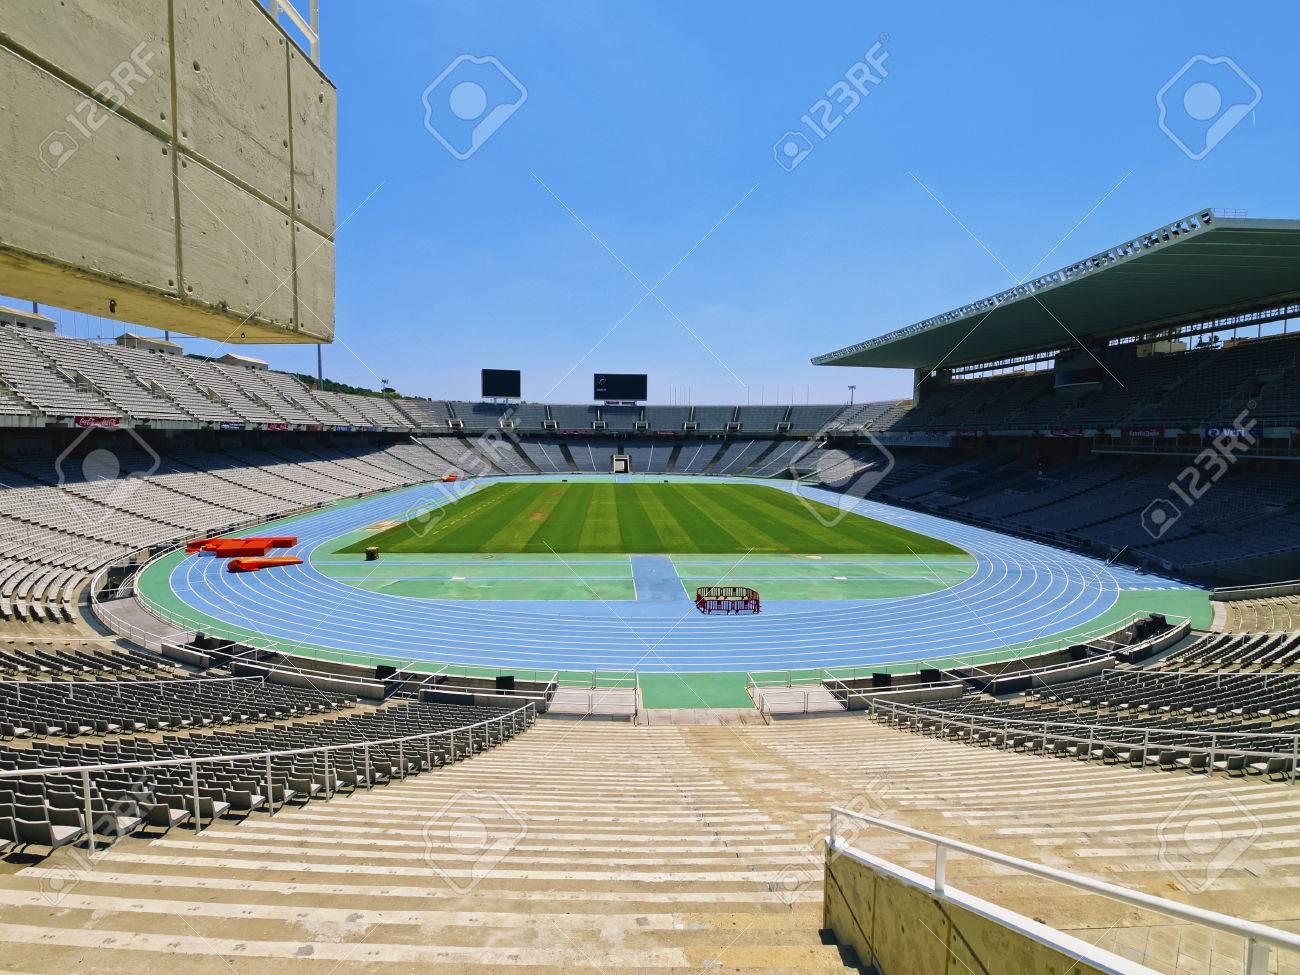 Estadio Olimpico De Montjuic En Barcelona Cataluna Espana Estadi Olimpic